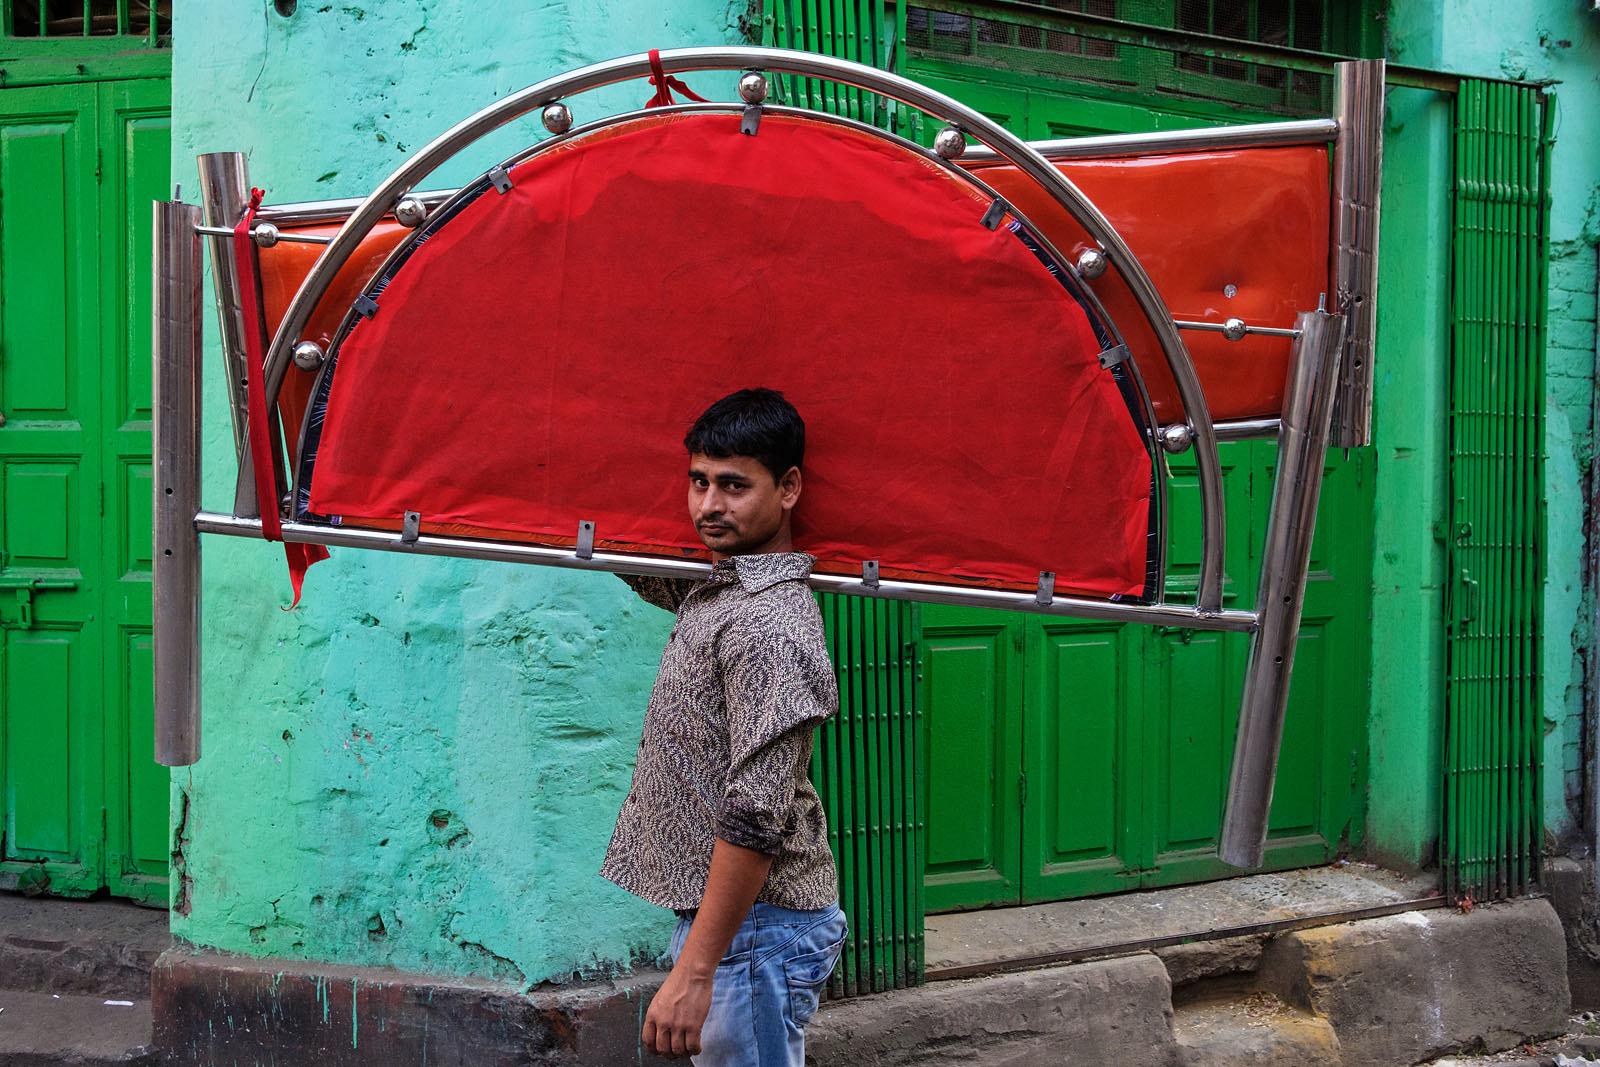 Red and green - Kolkata, India | by Maciej Dakowicz